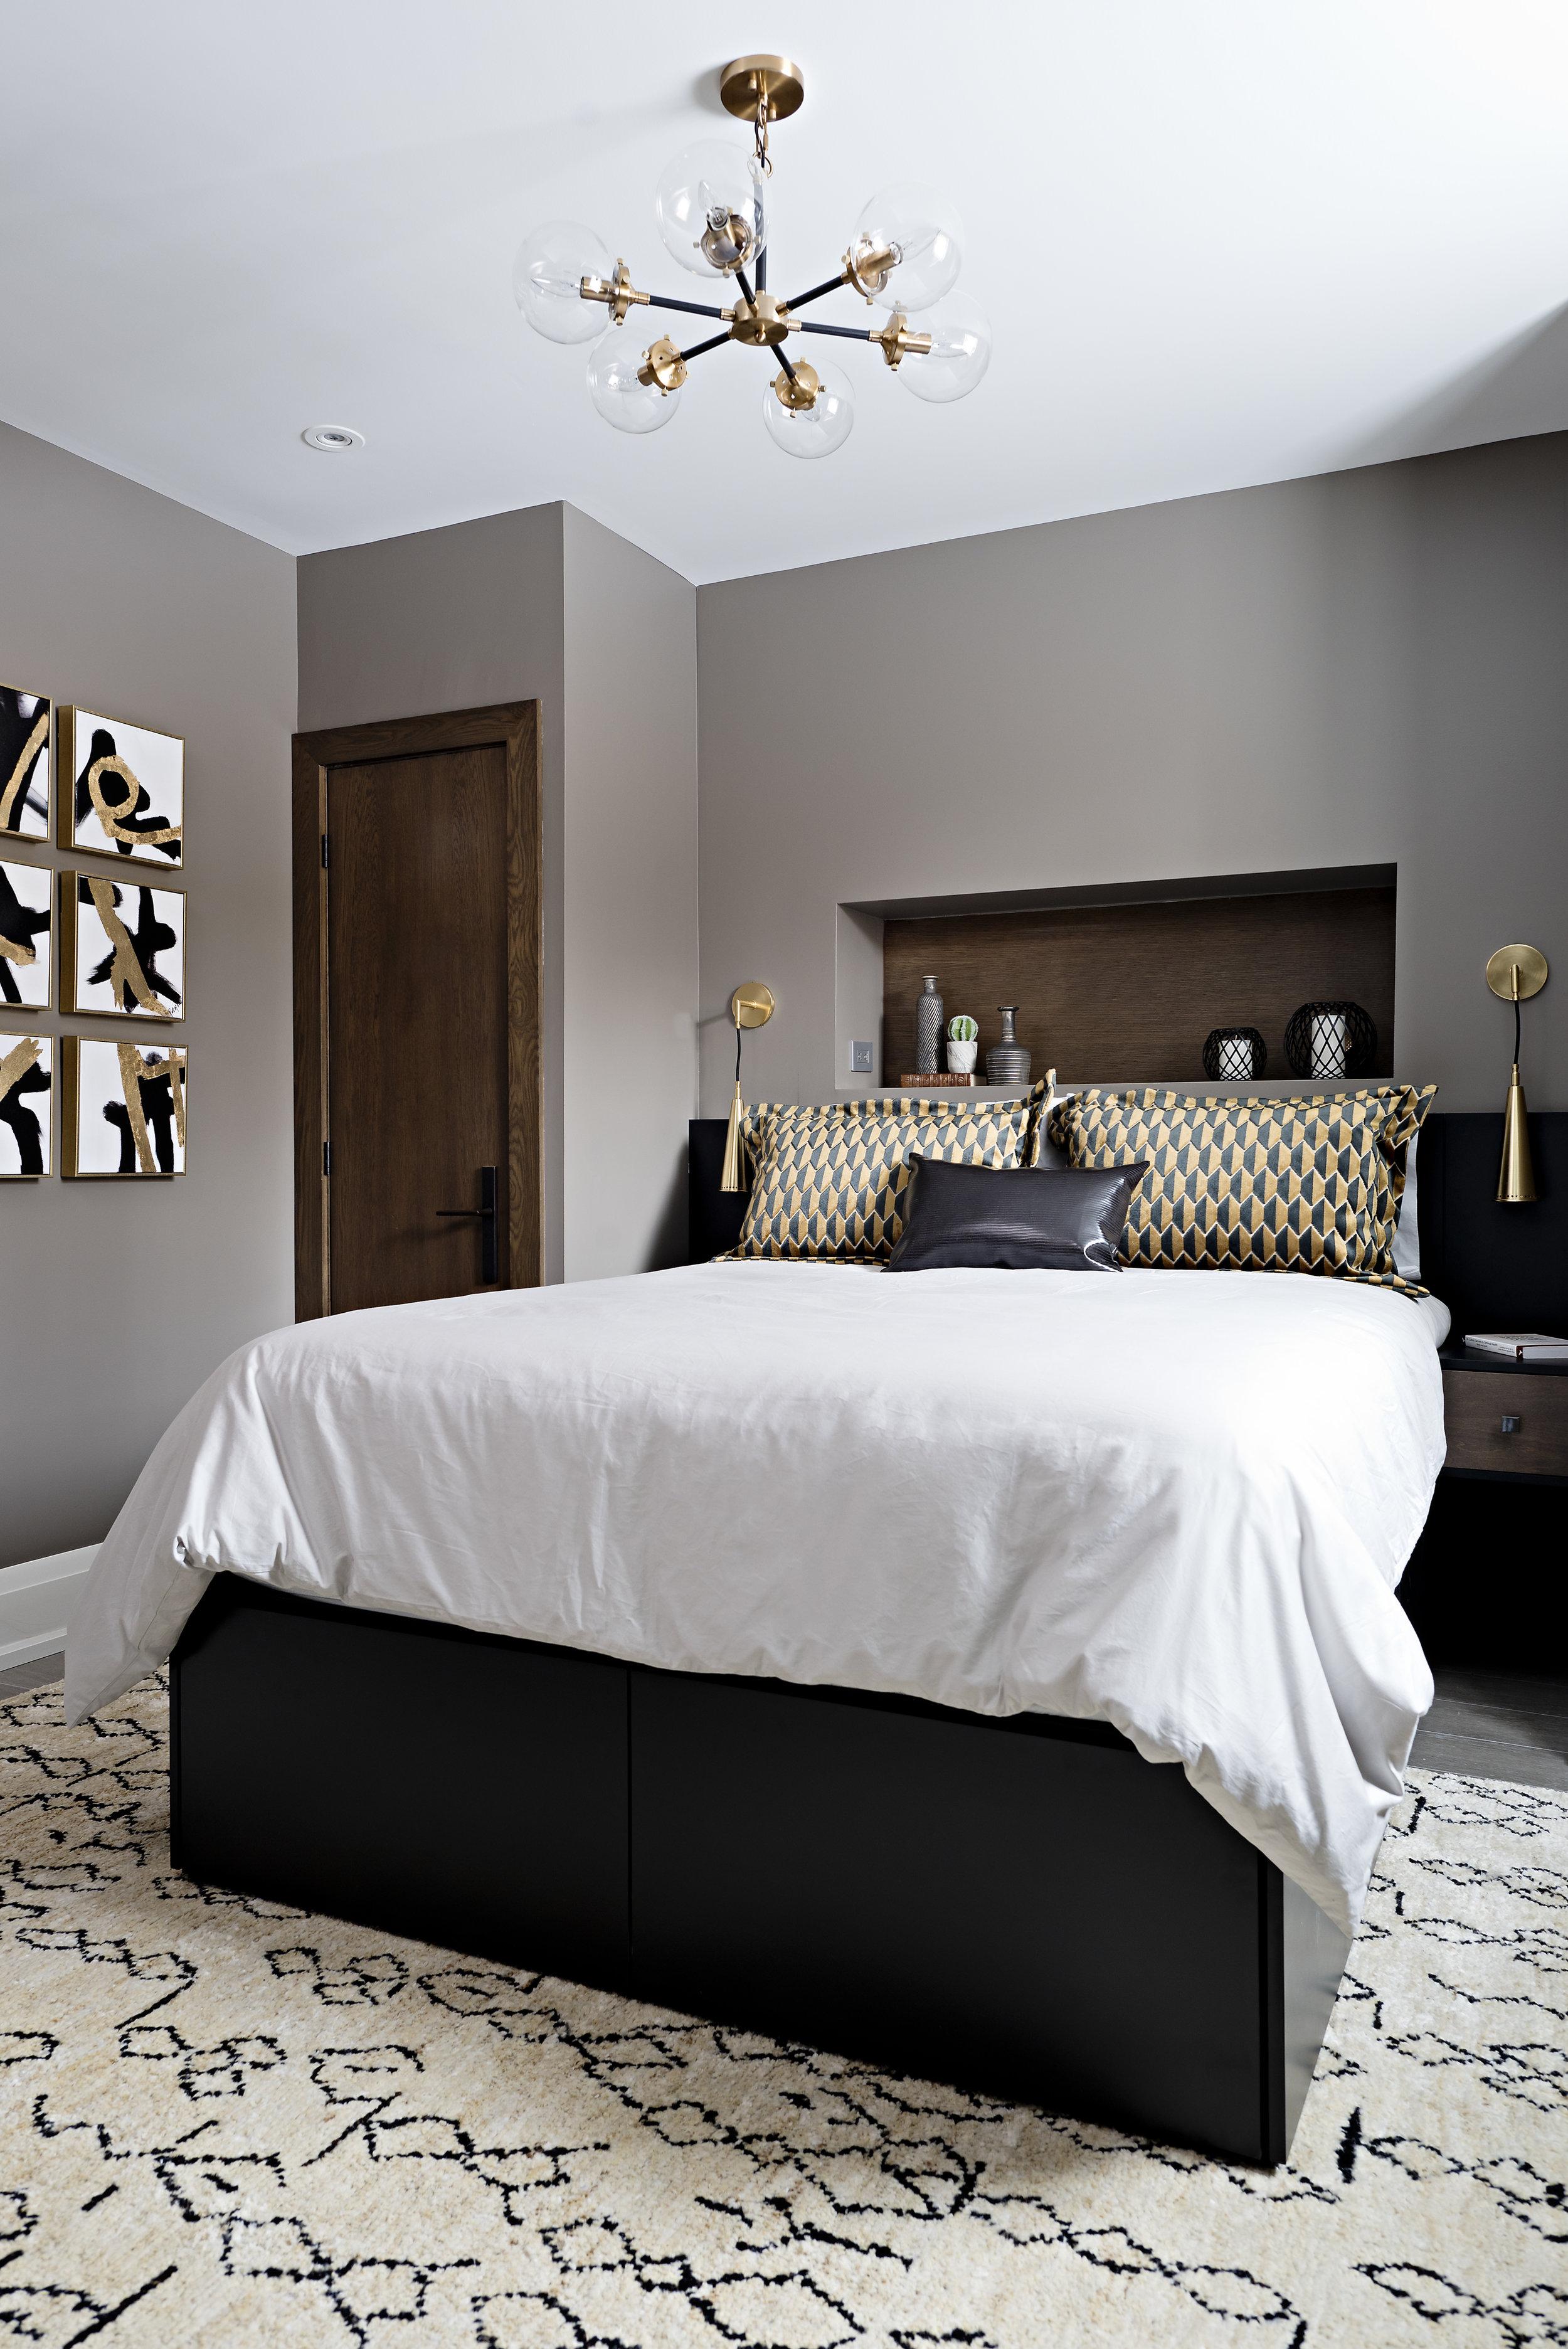 Interior Designer Pizzale Design Stylish Boys Bedroom Black and Gold Art and Pillows Custom Millwork.jpg